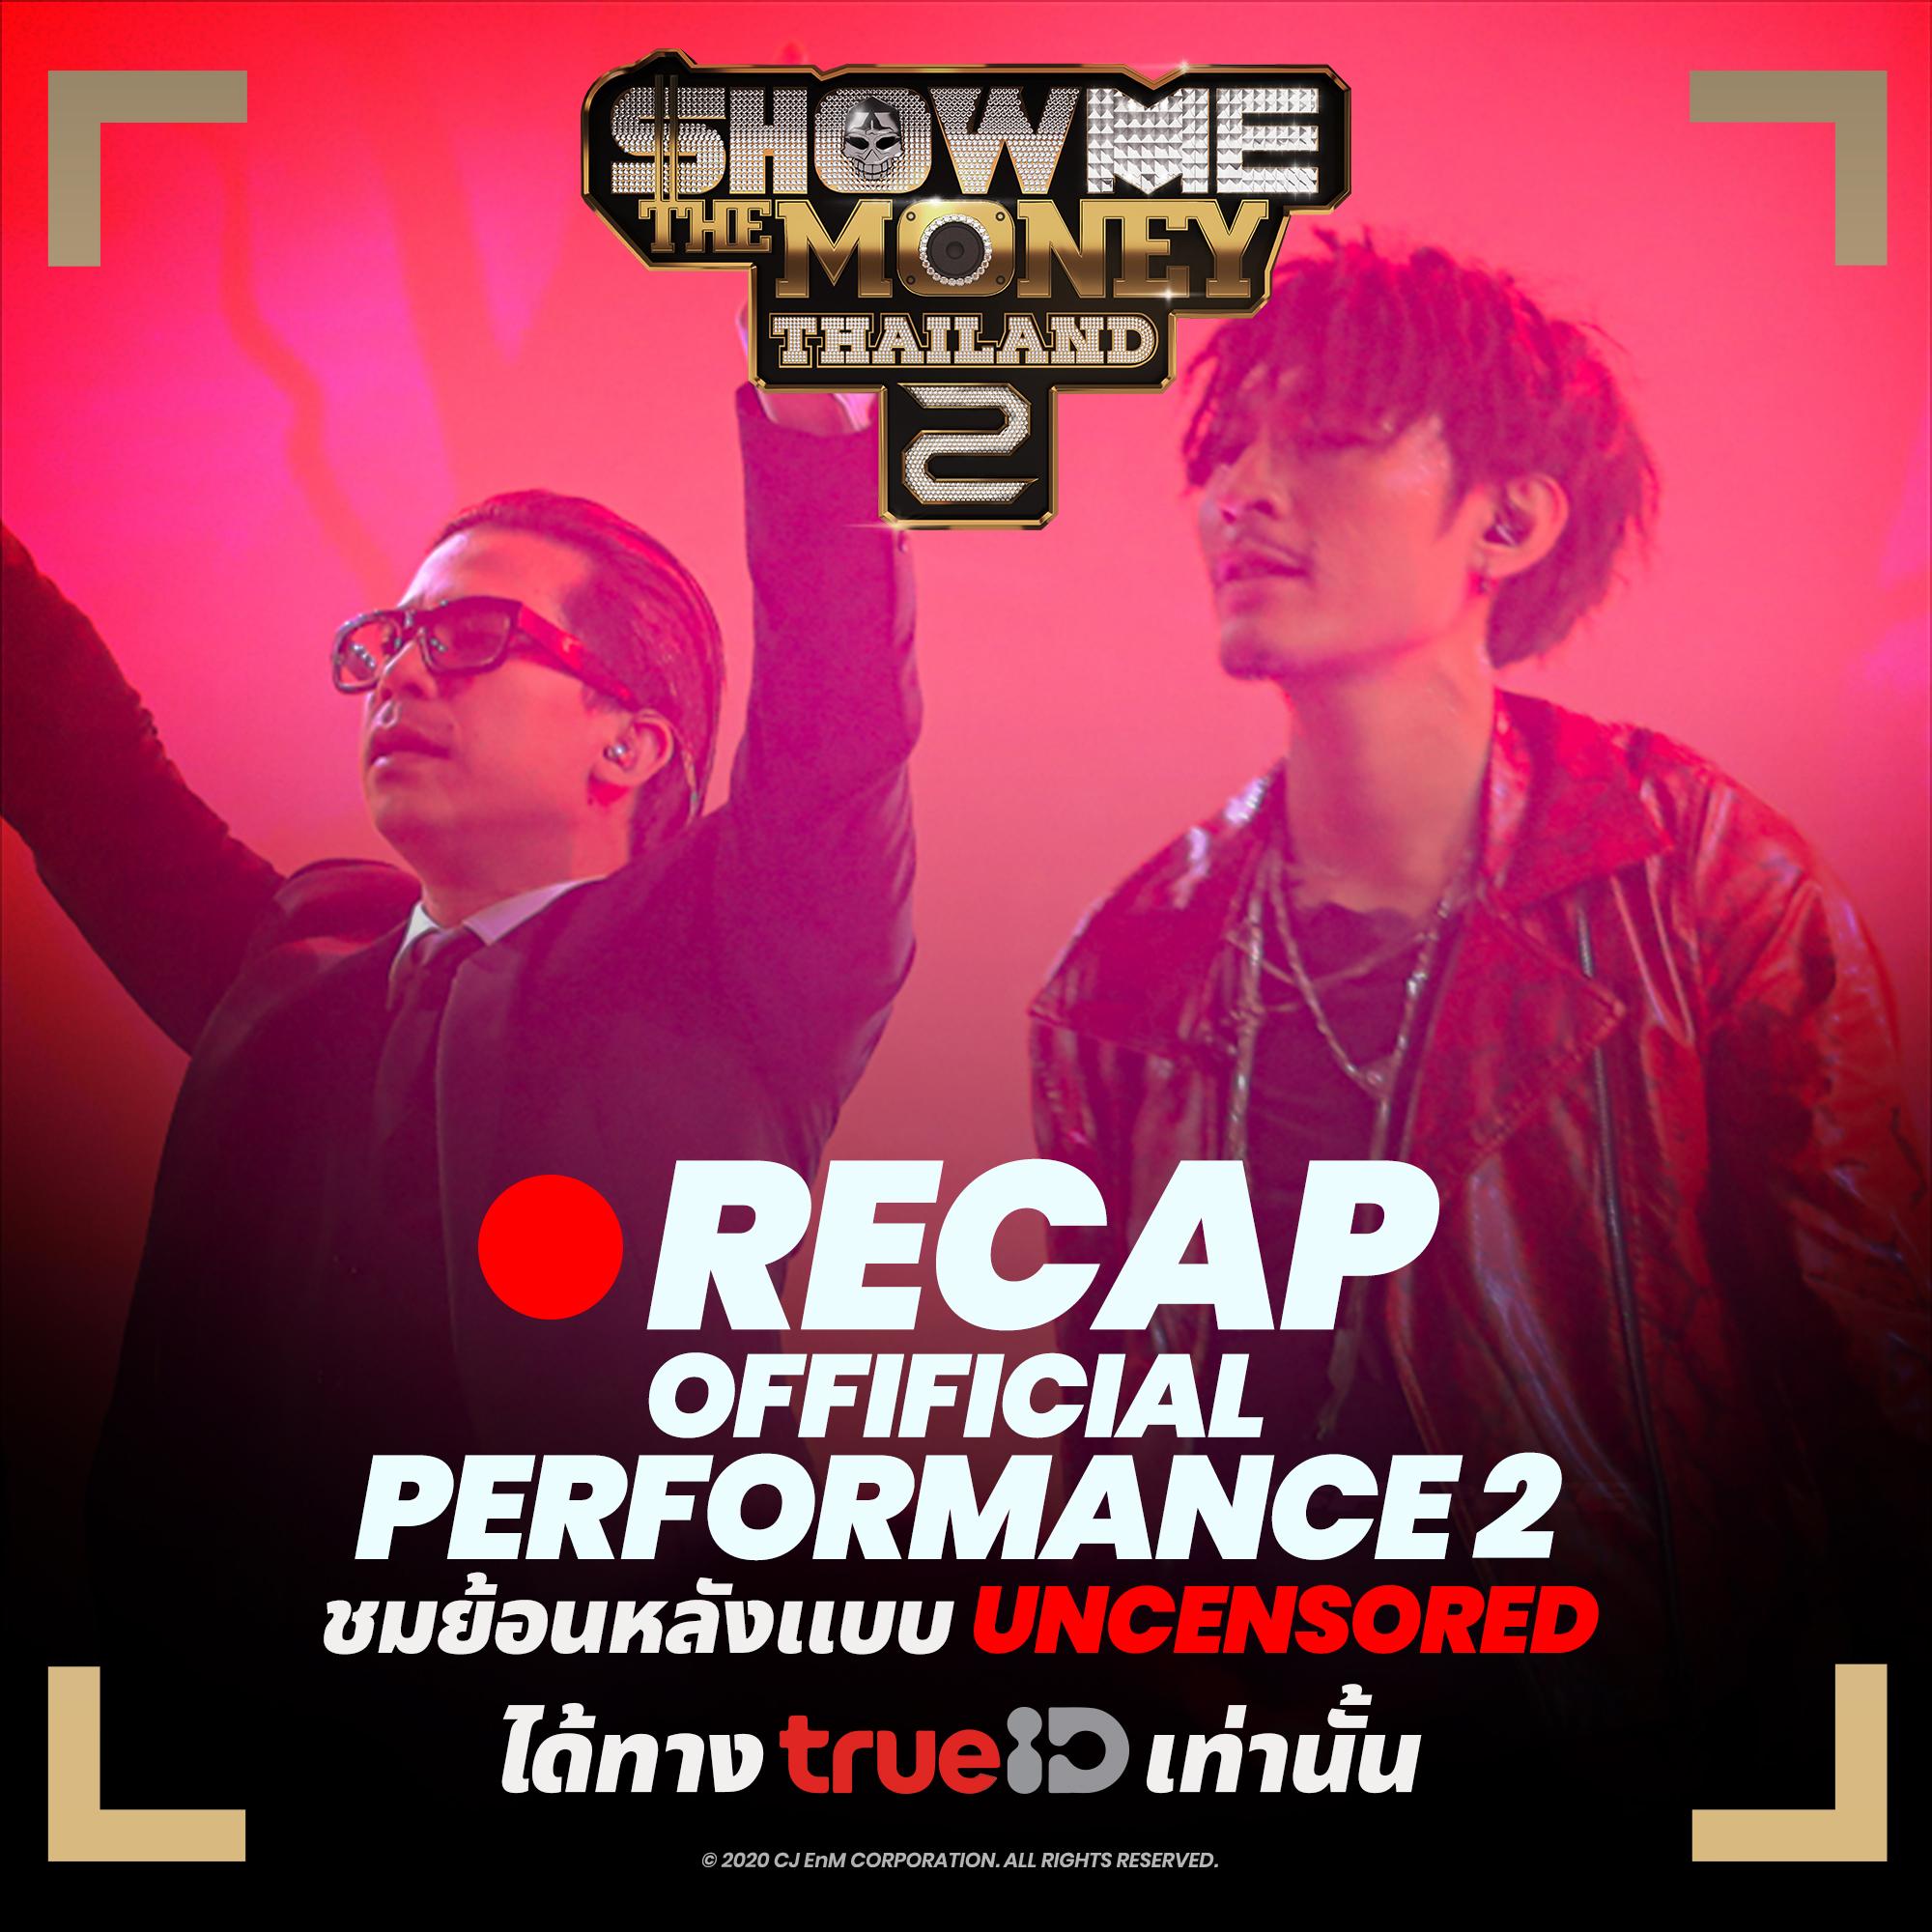 RECAP : Official Performance 2